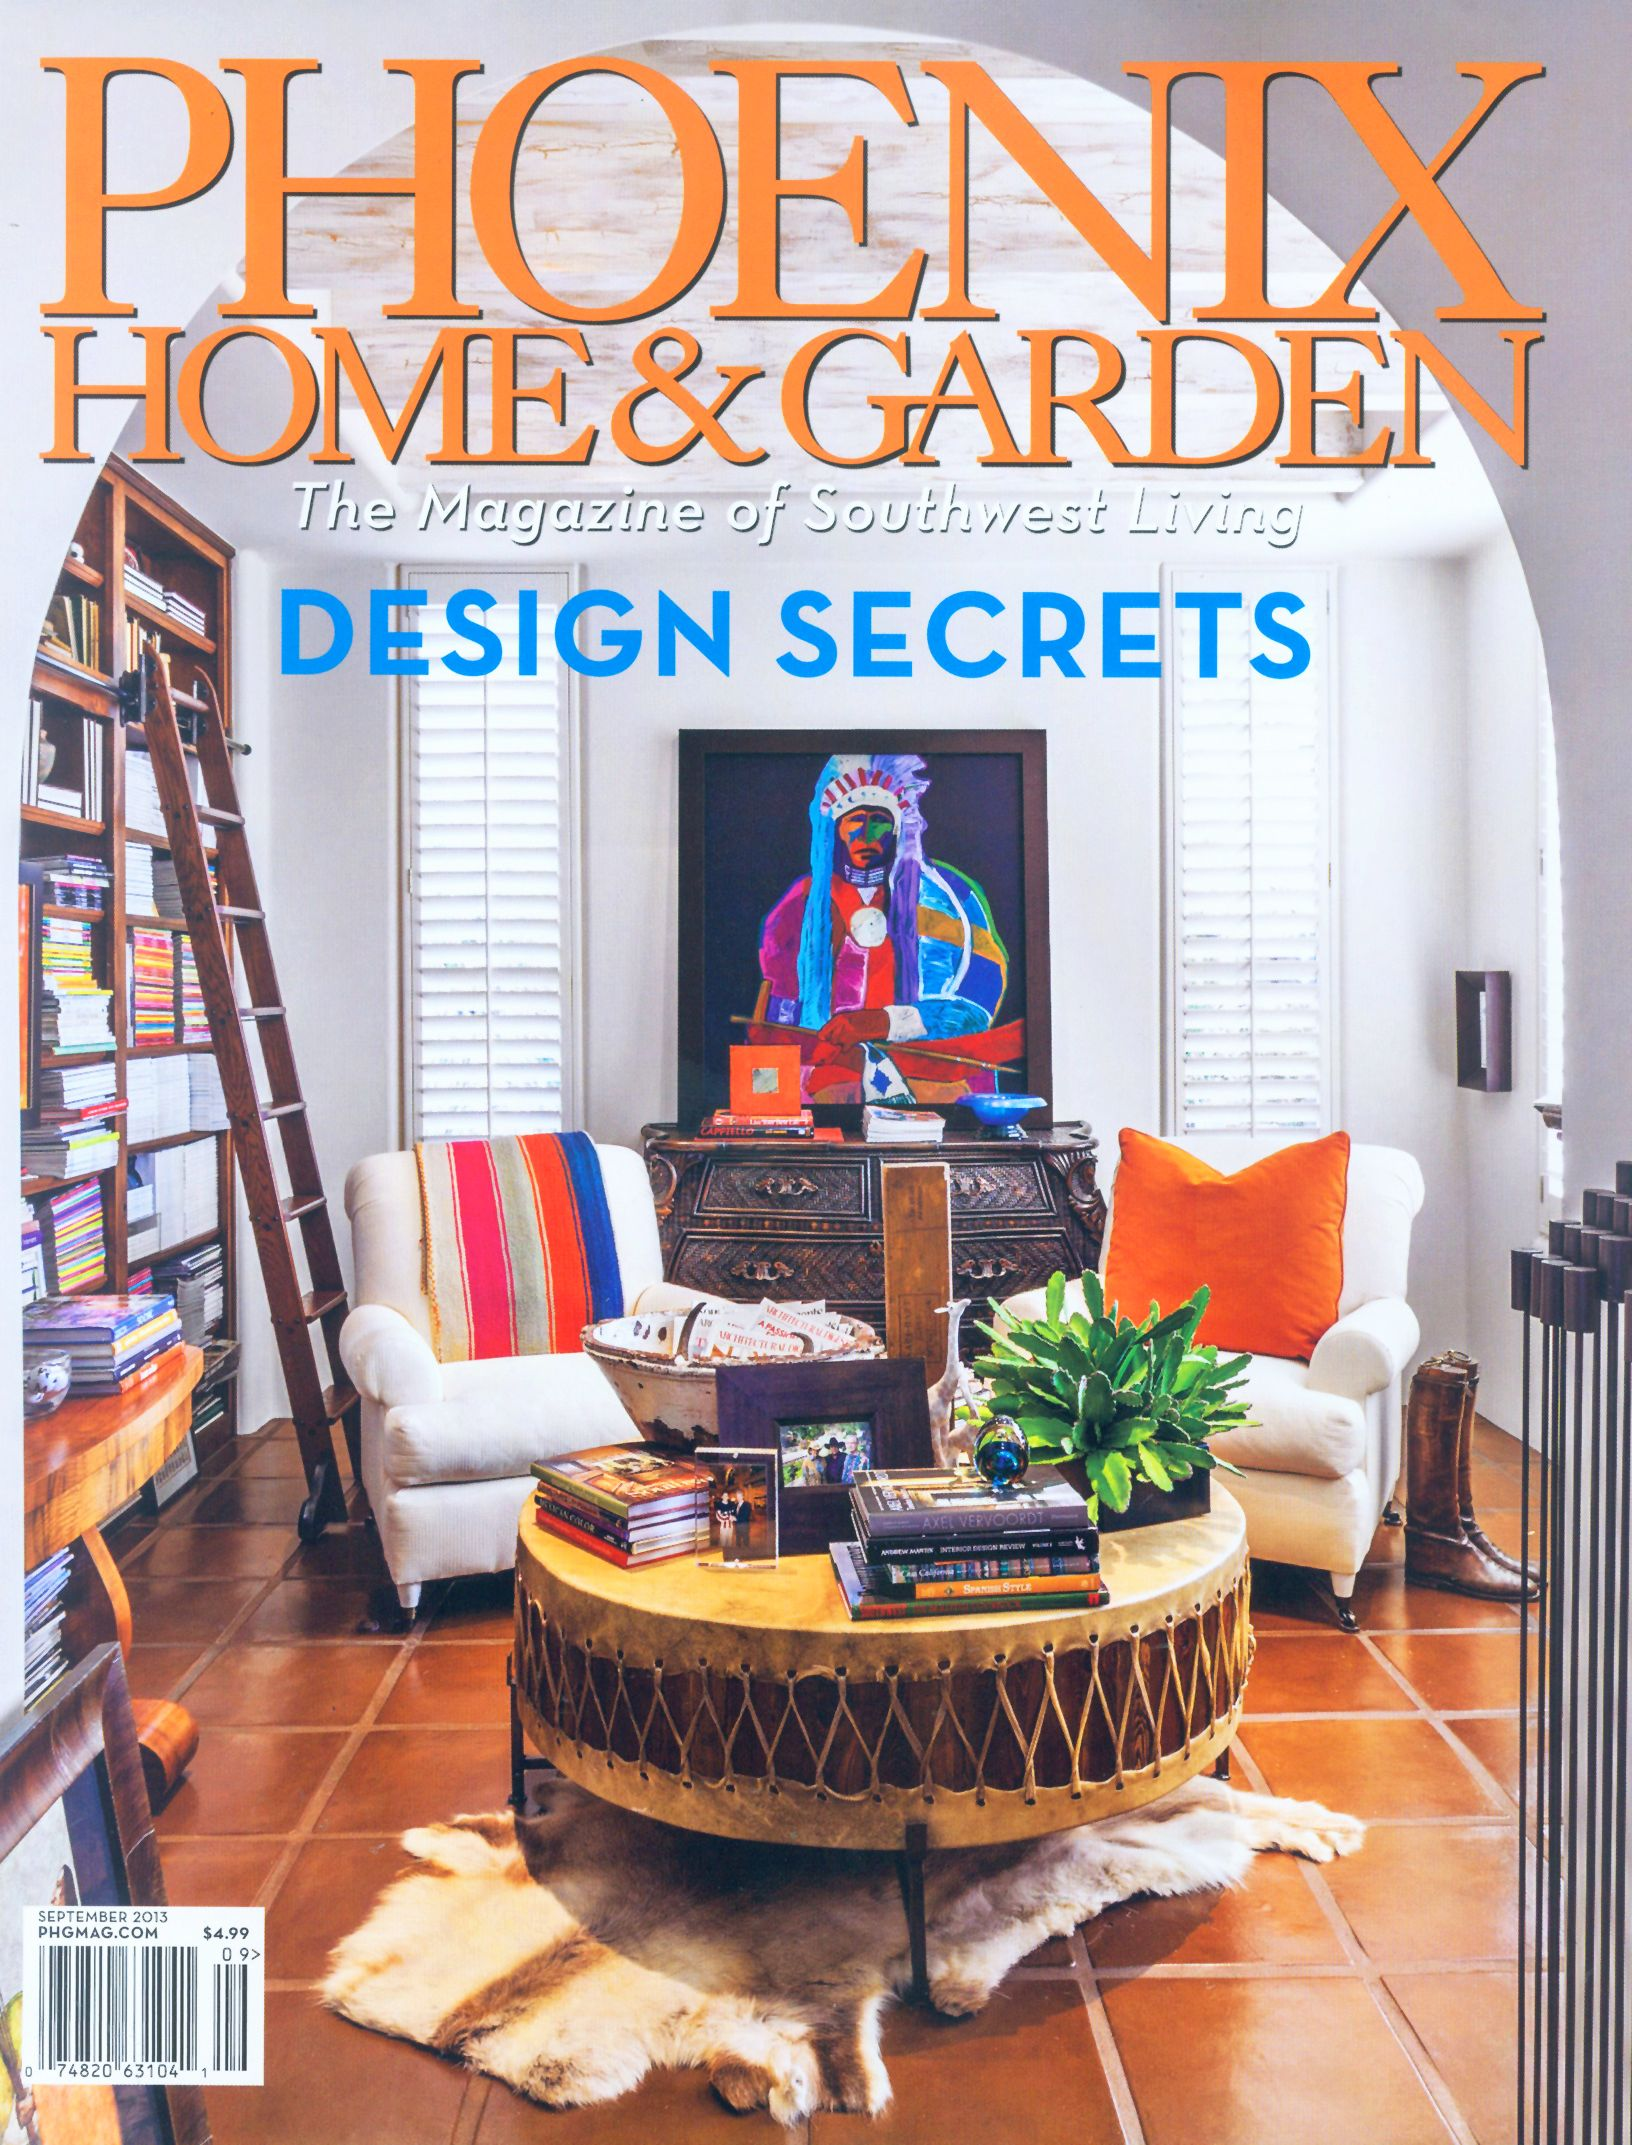 Elegant Phoenix Home And Garden (September 2013) Pictures